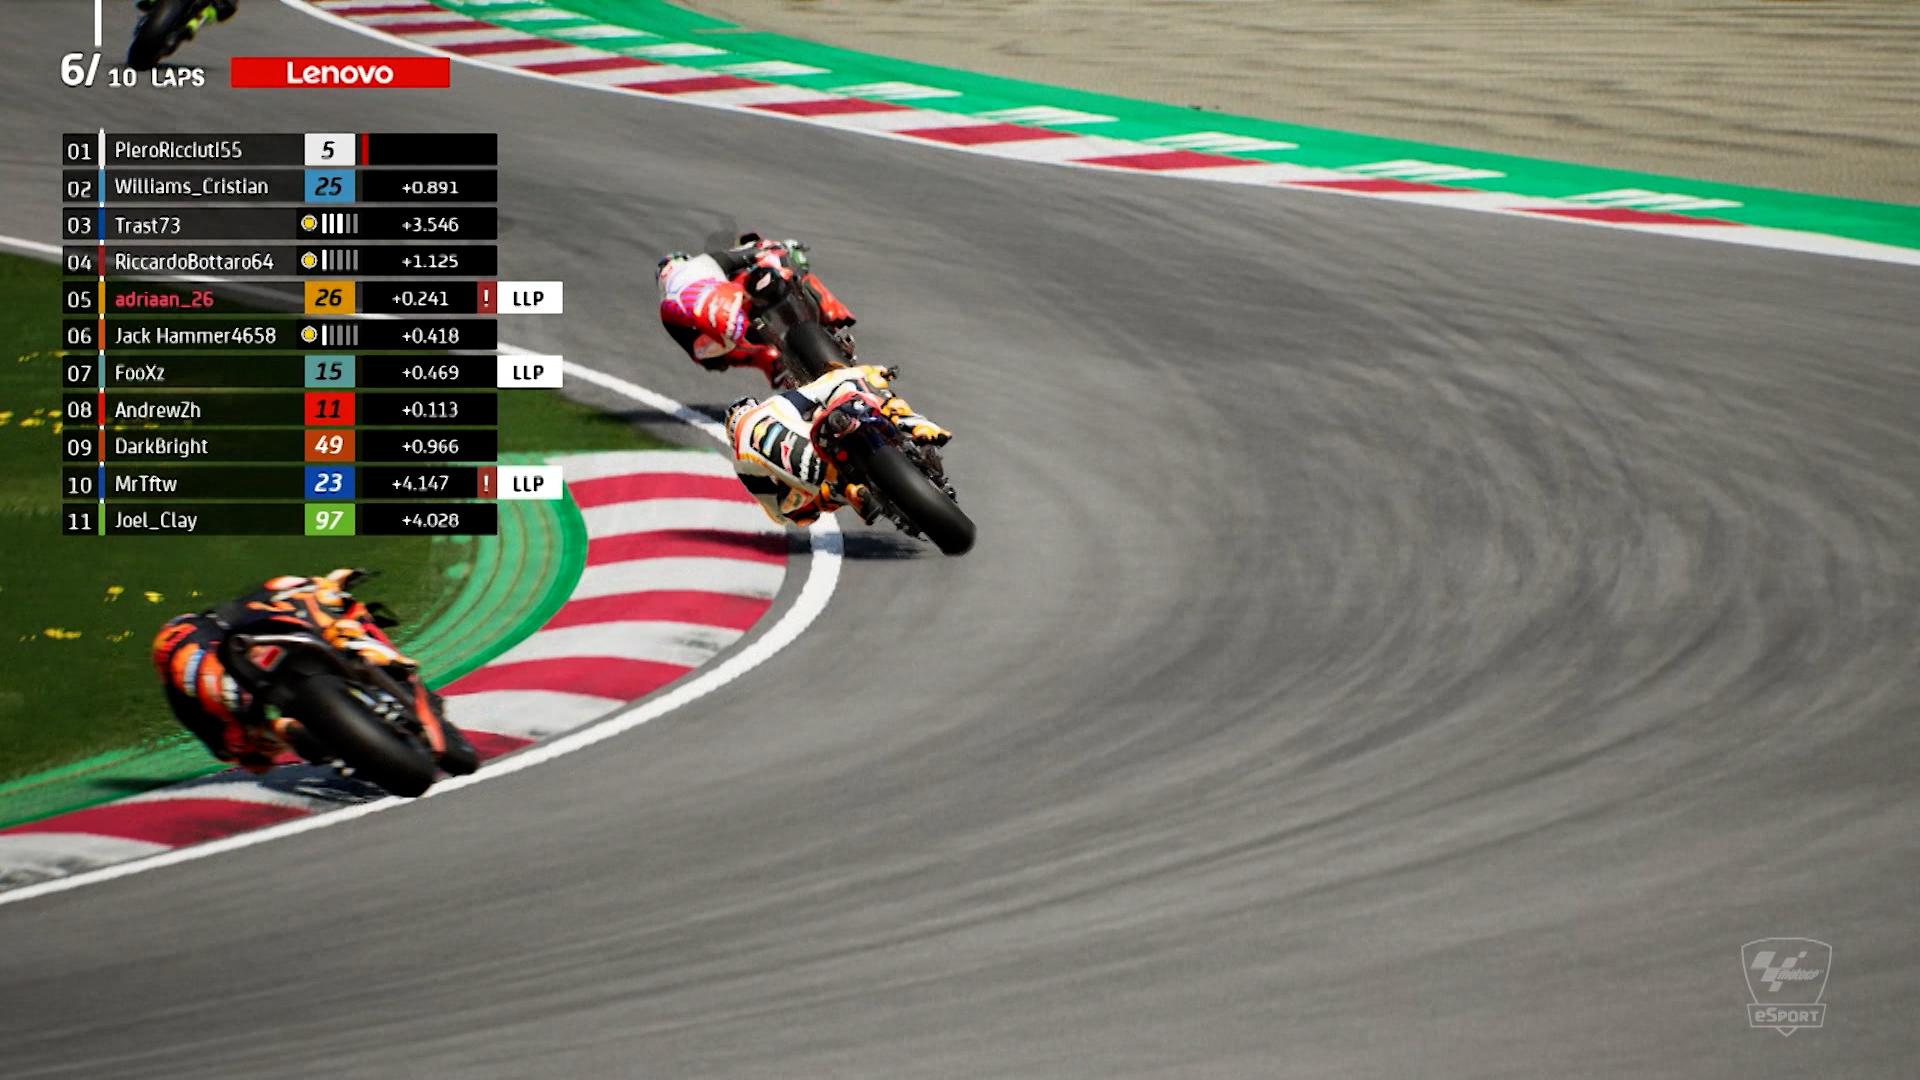 2021_MotoGP_00_GS2_eSPORTS_GLOBALSERIES_ROUND_02_PGM.00_45_54_24.Imagen-fija007